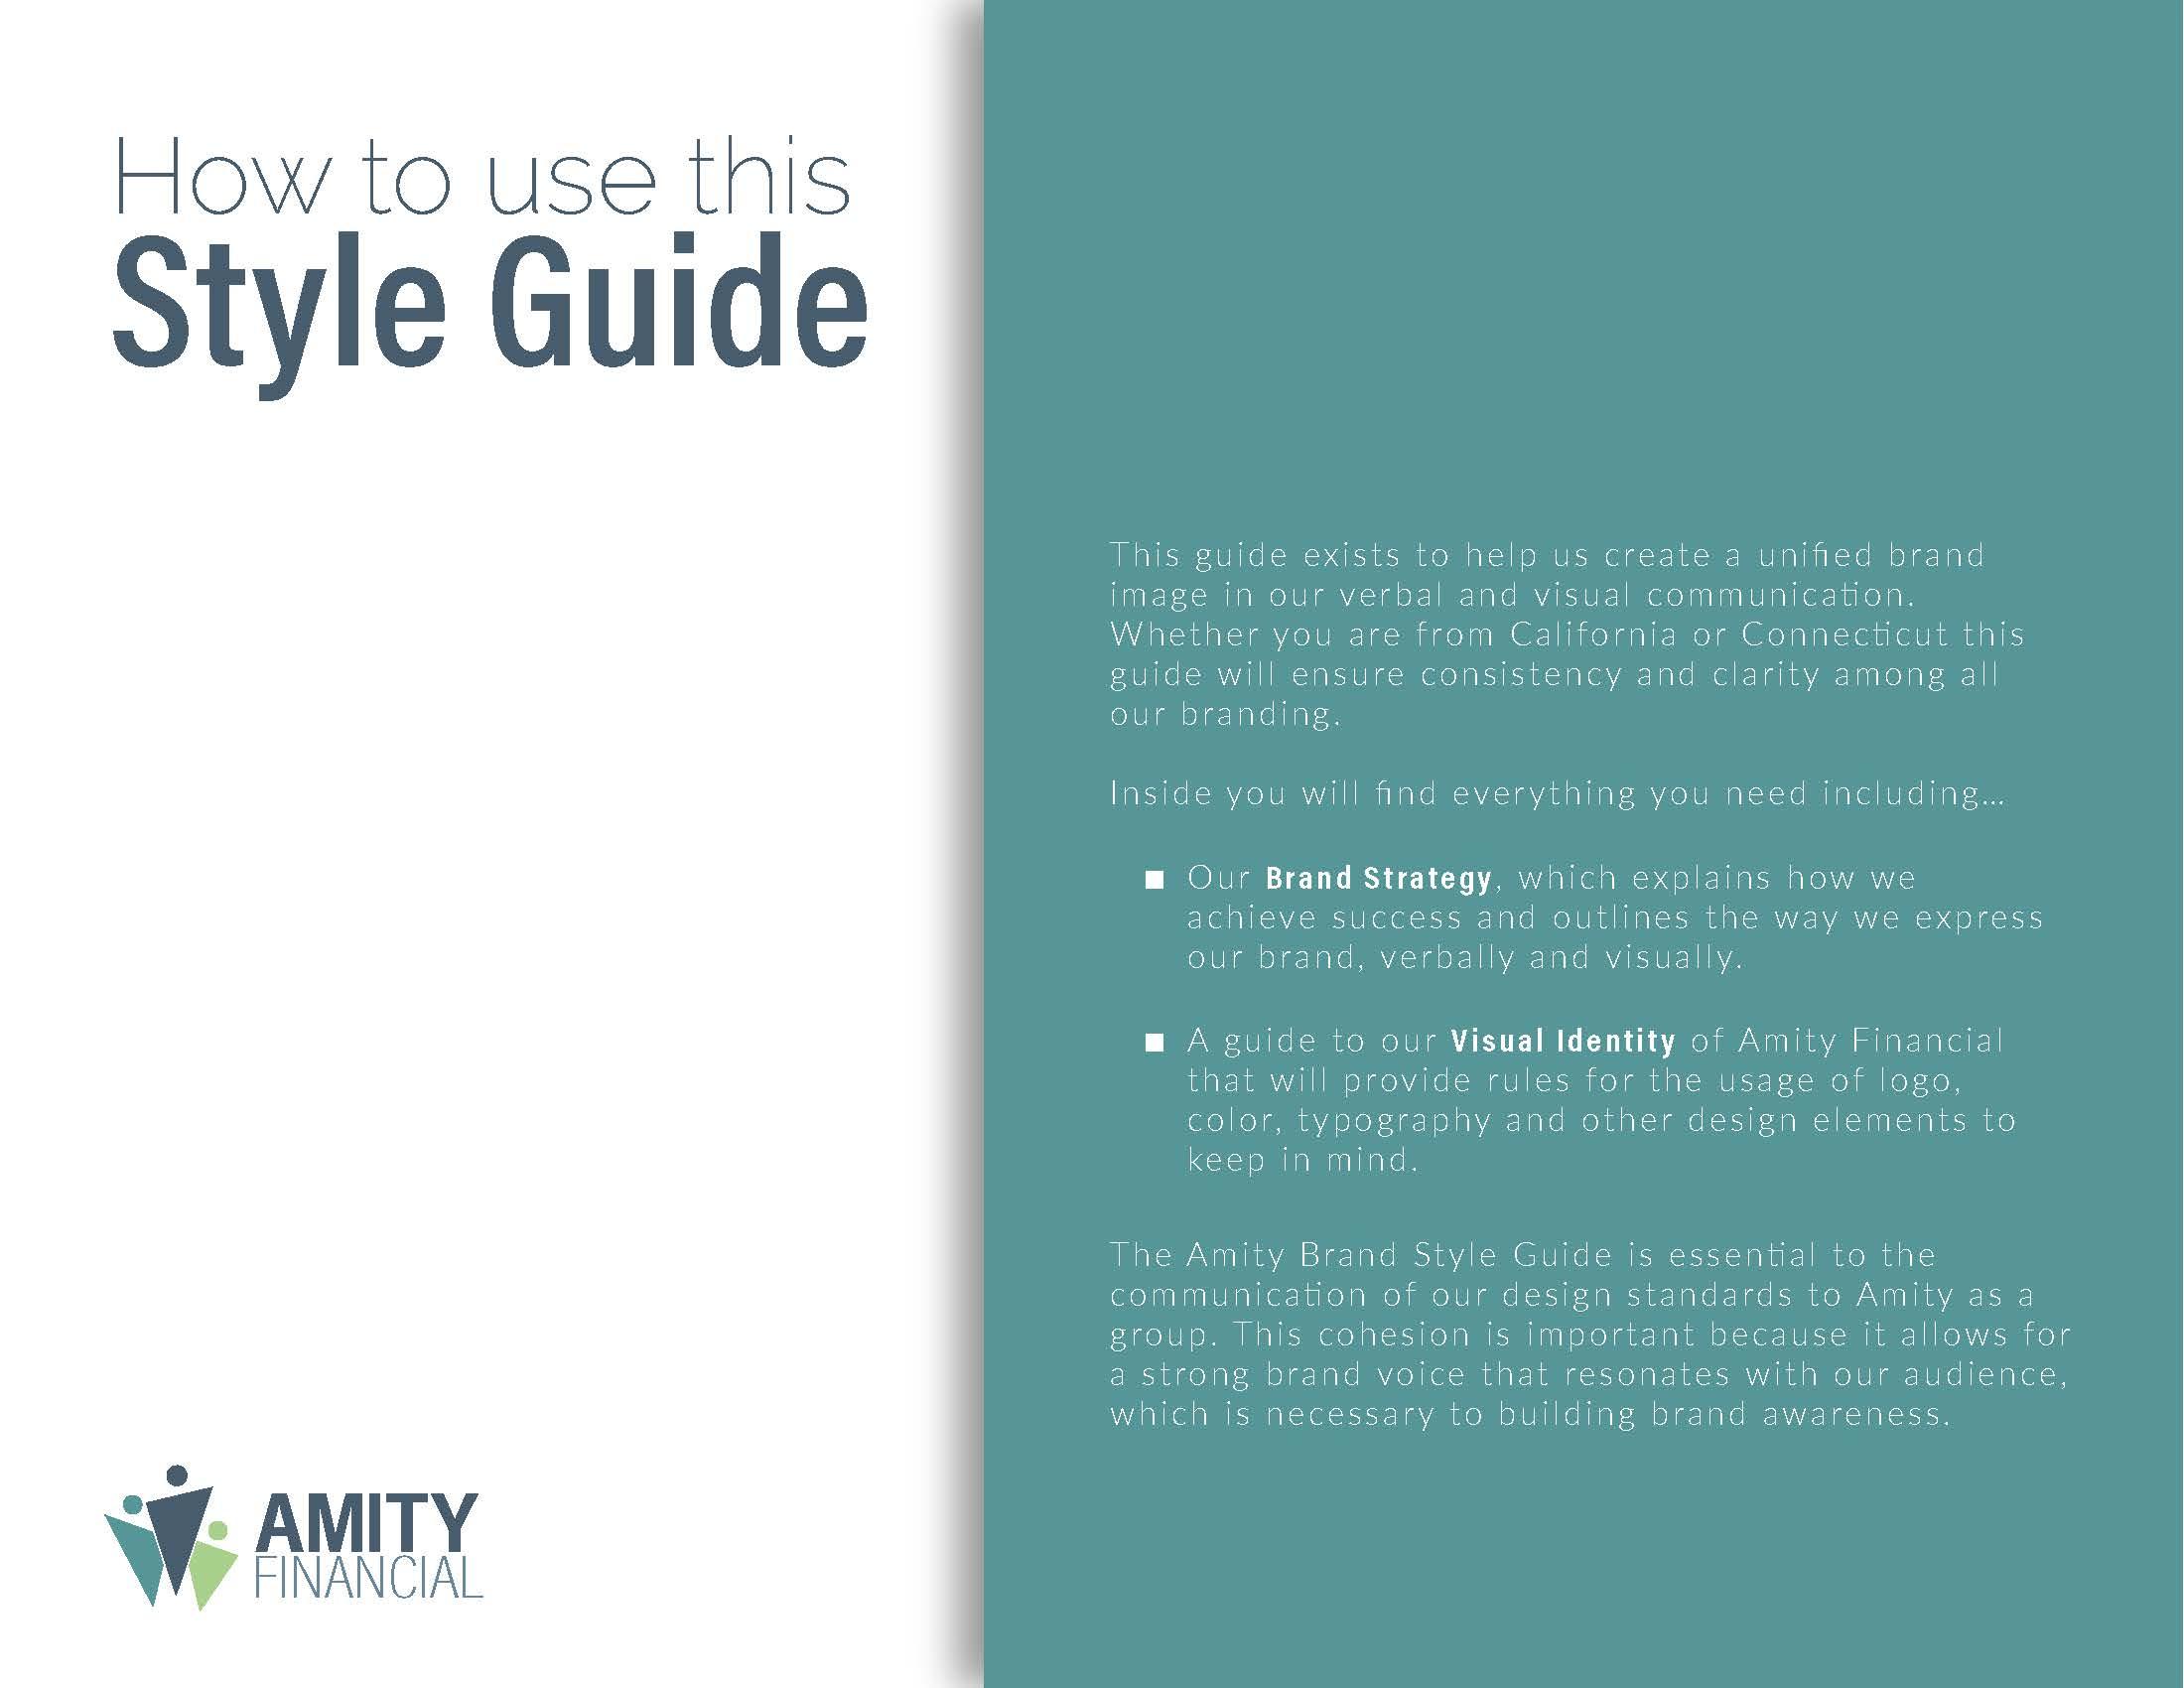 Amity-StyleGuide FINAL_Page_04.jpg